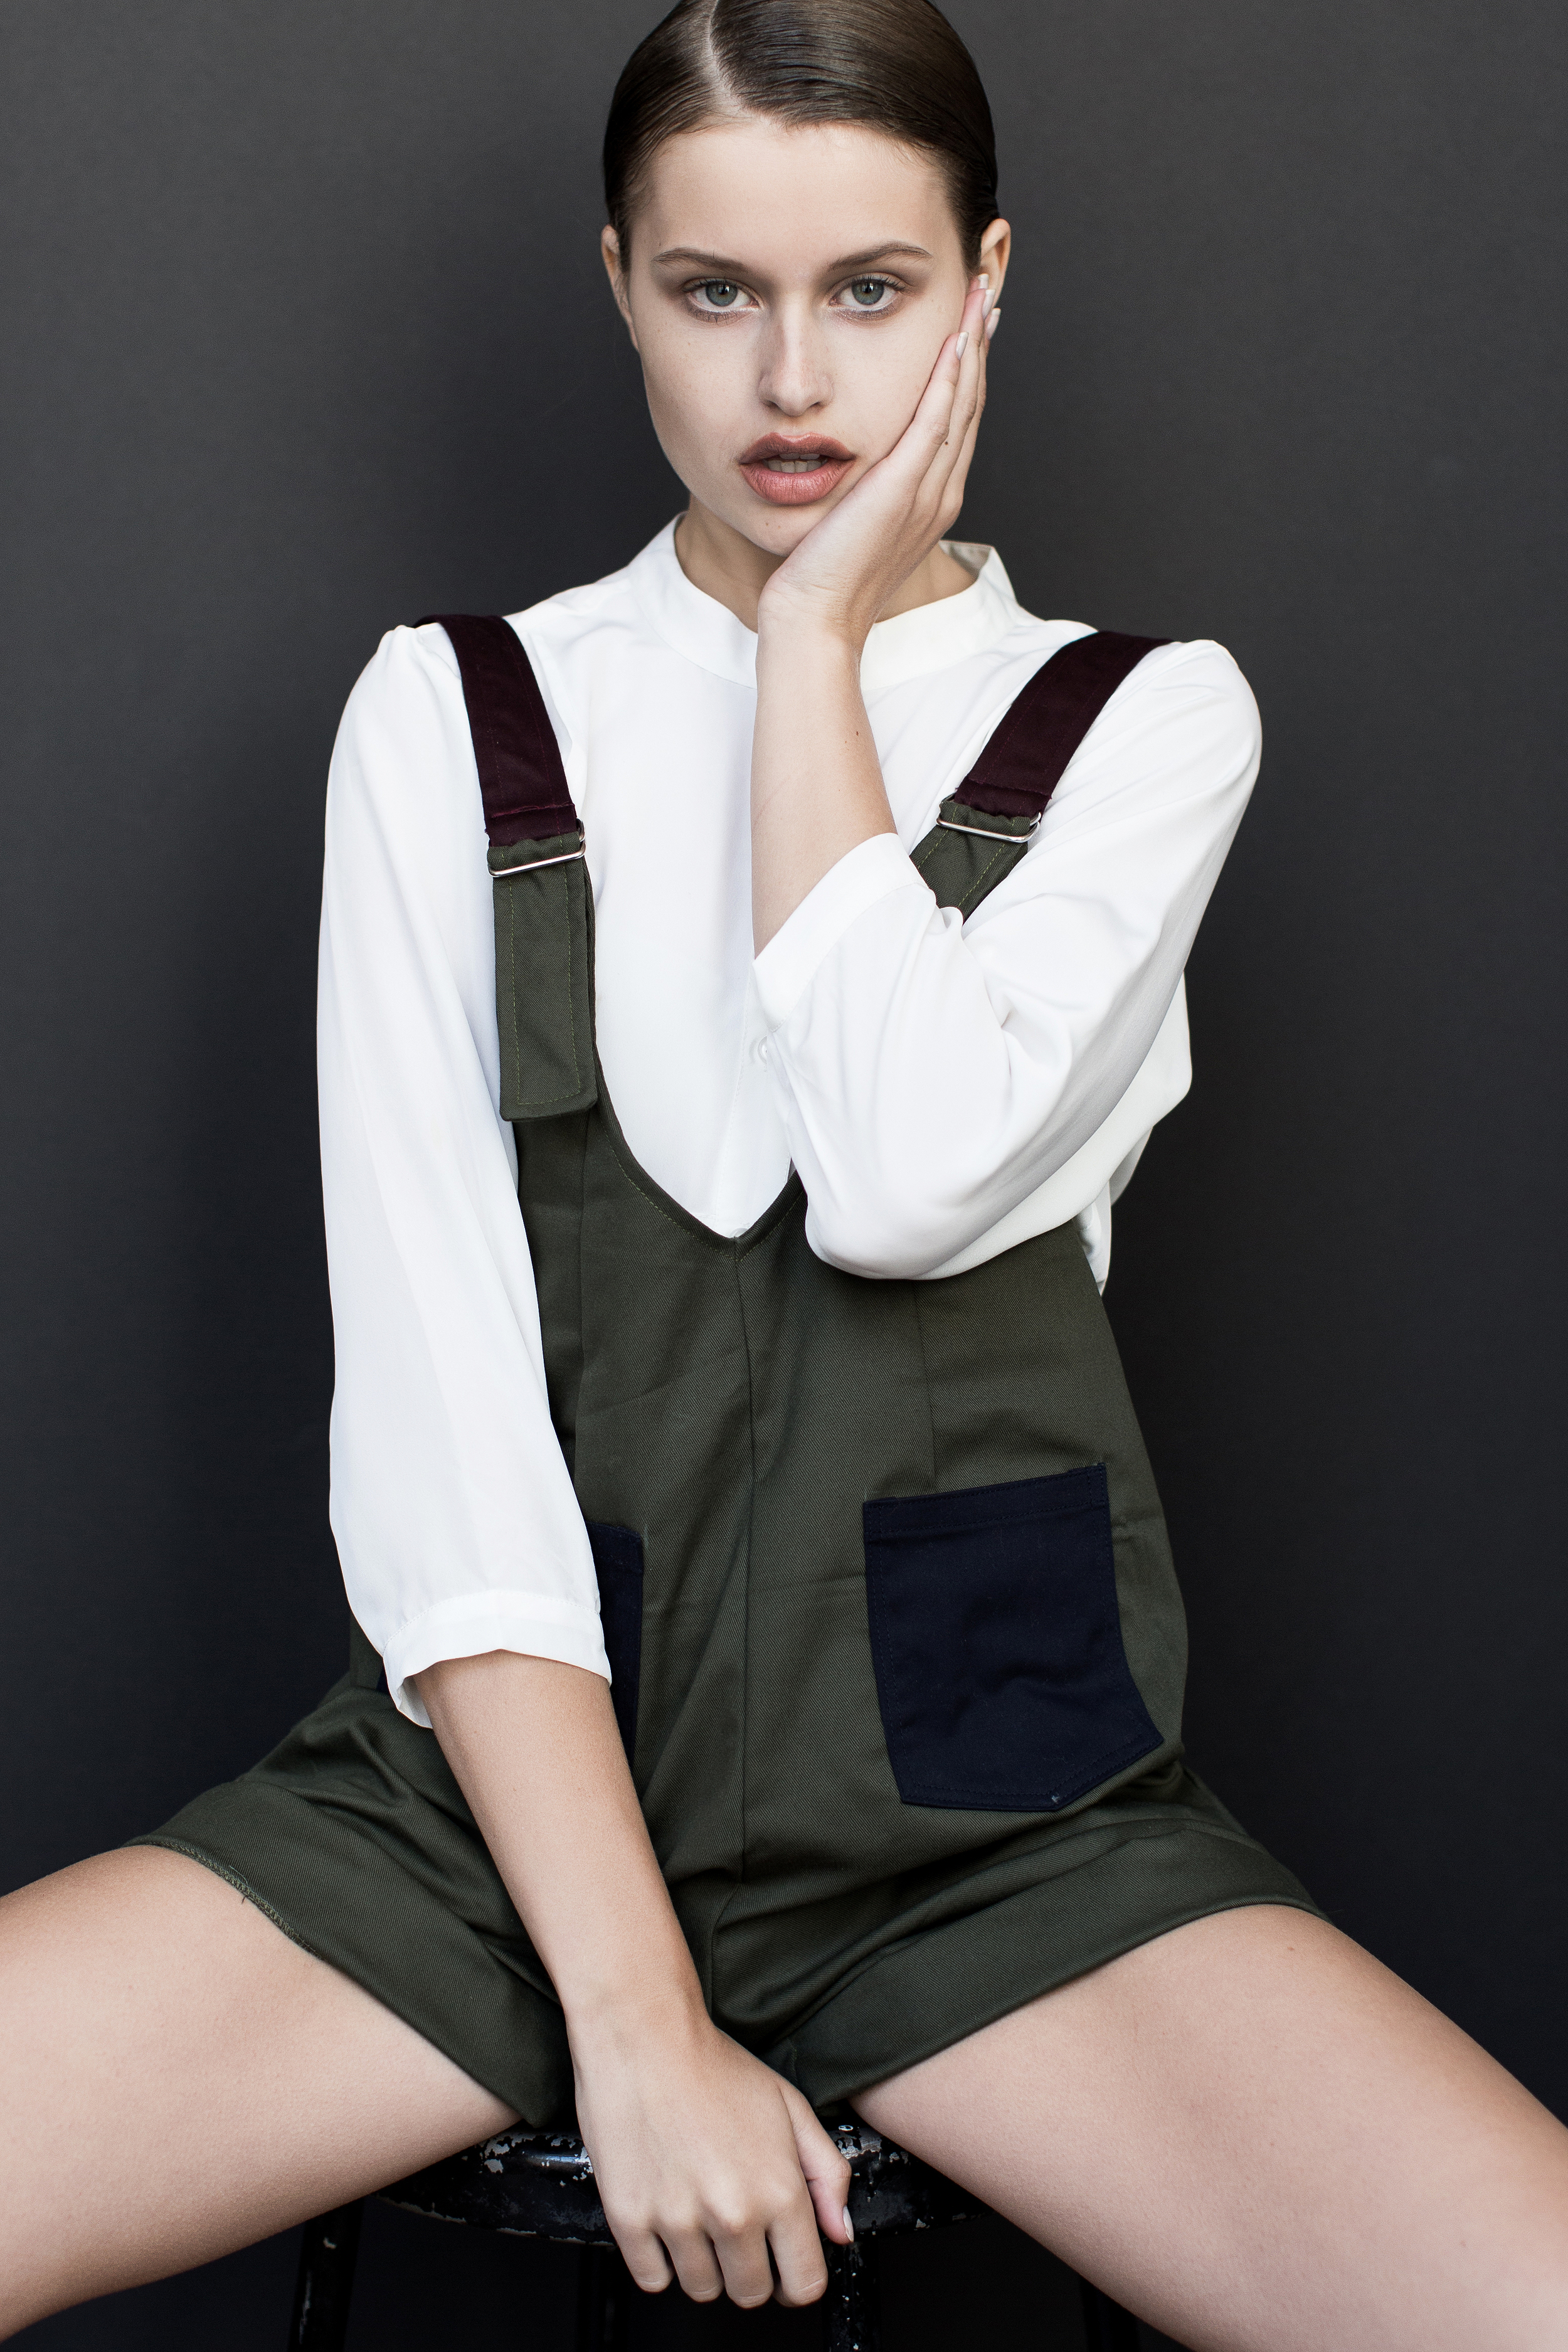 model LEXI WOOD   photographer BONNIE NICHOALDS   featured designer  JAW MAKER   styled by NIK